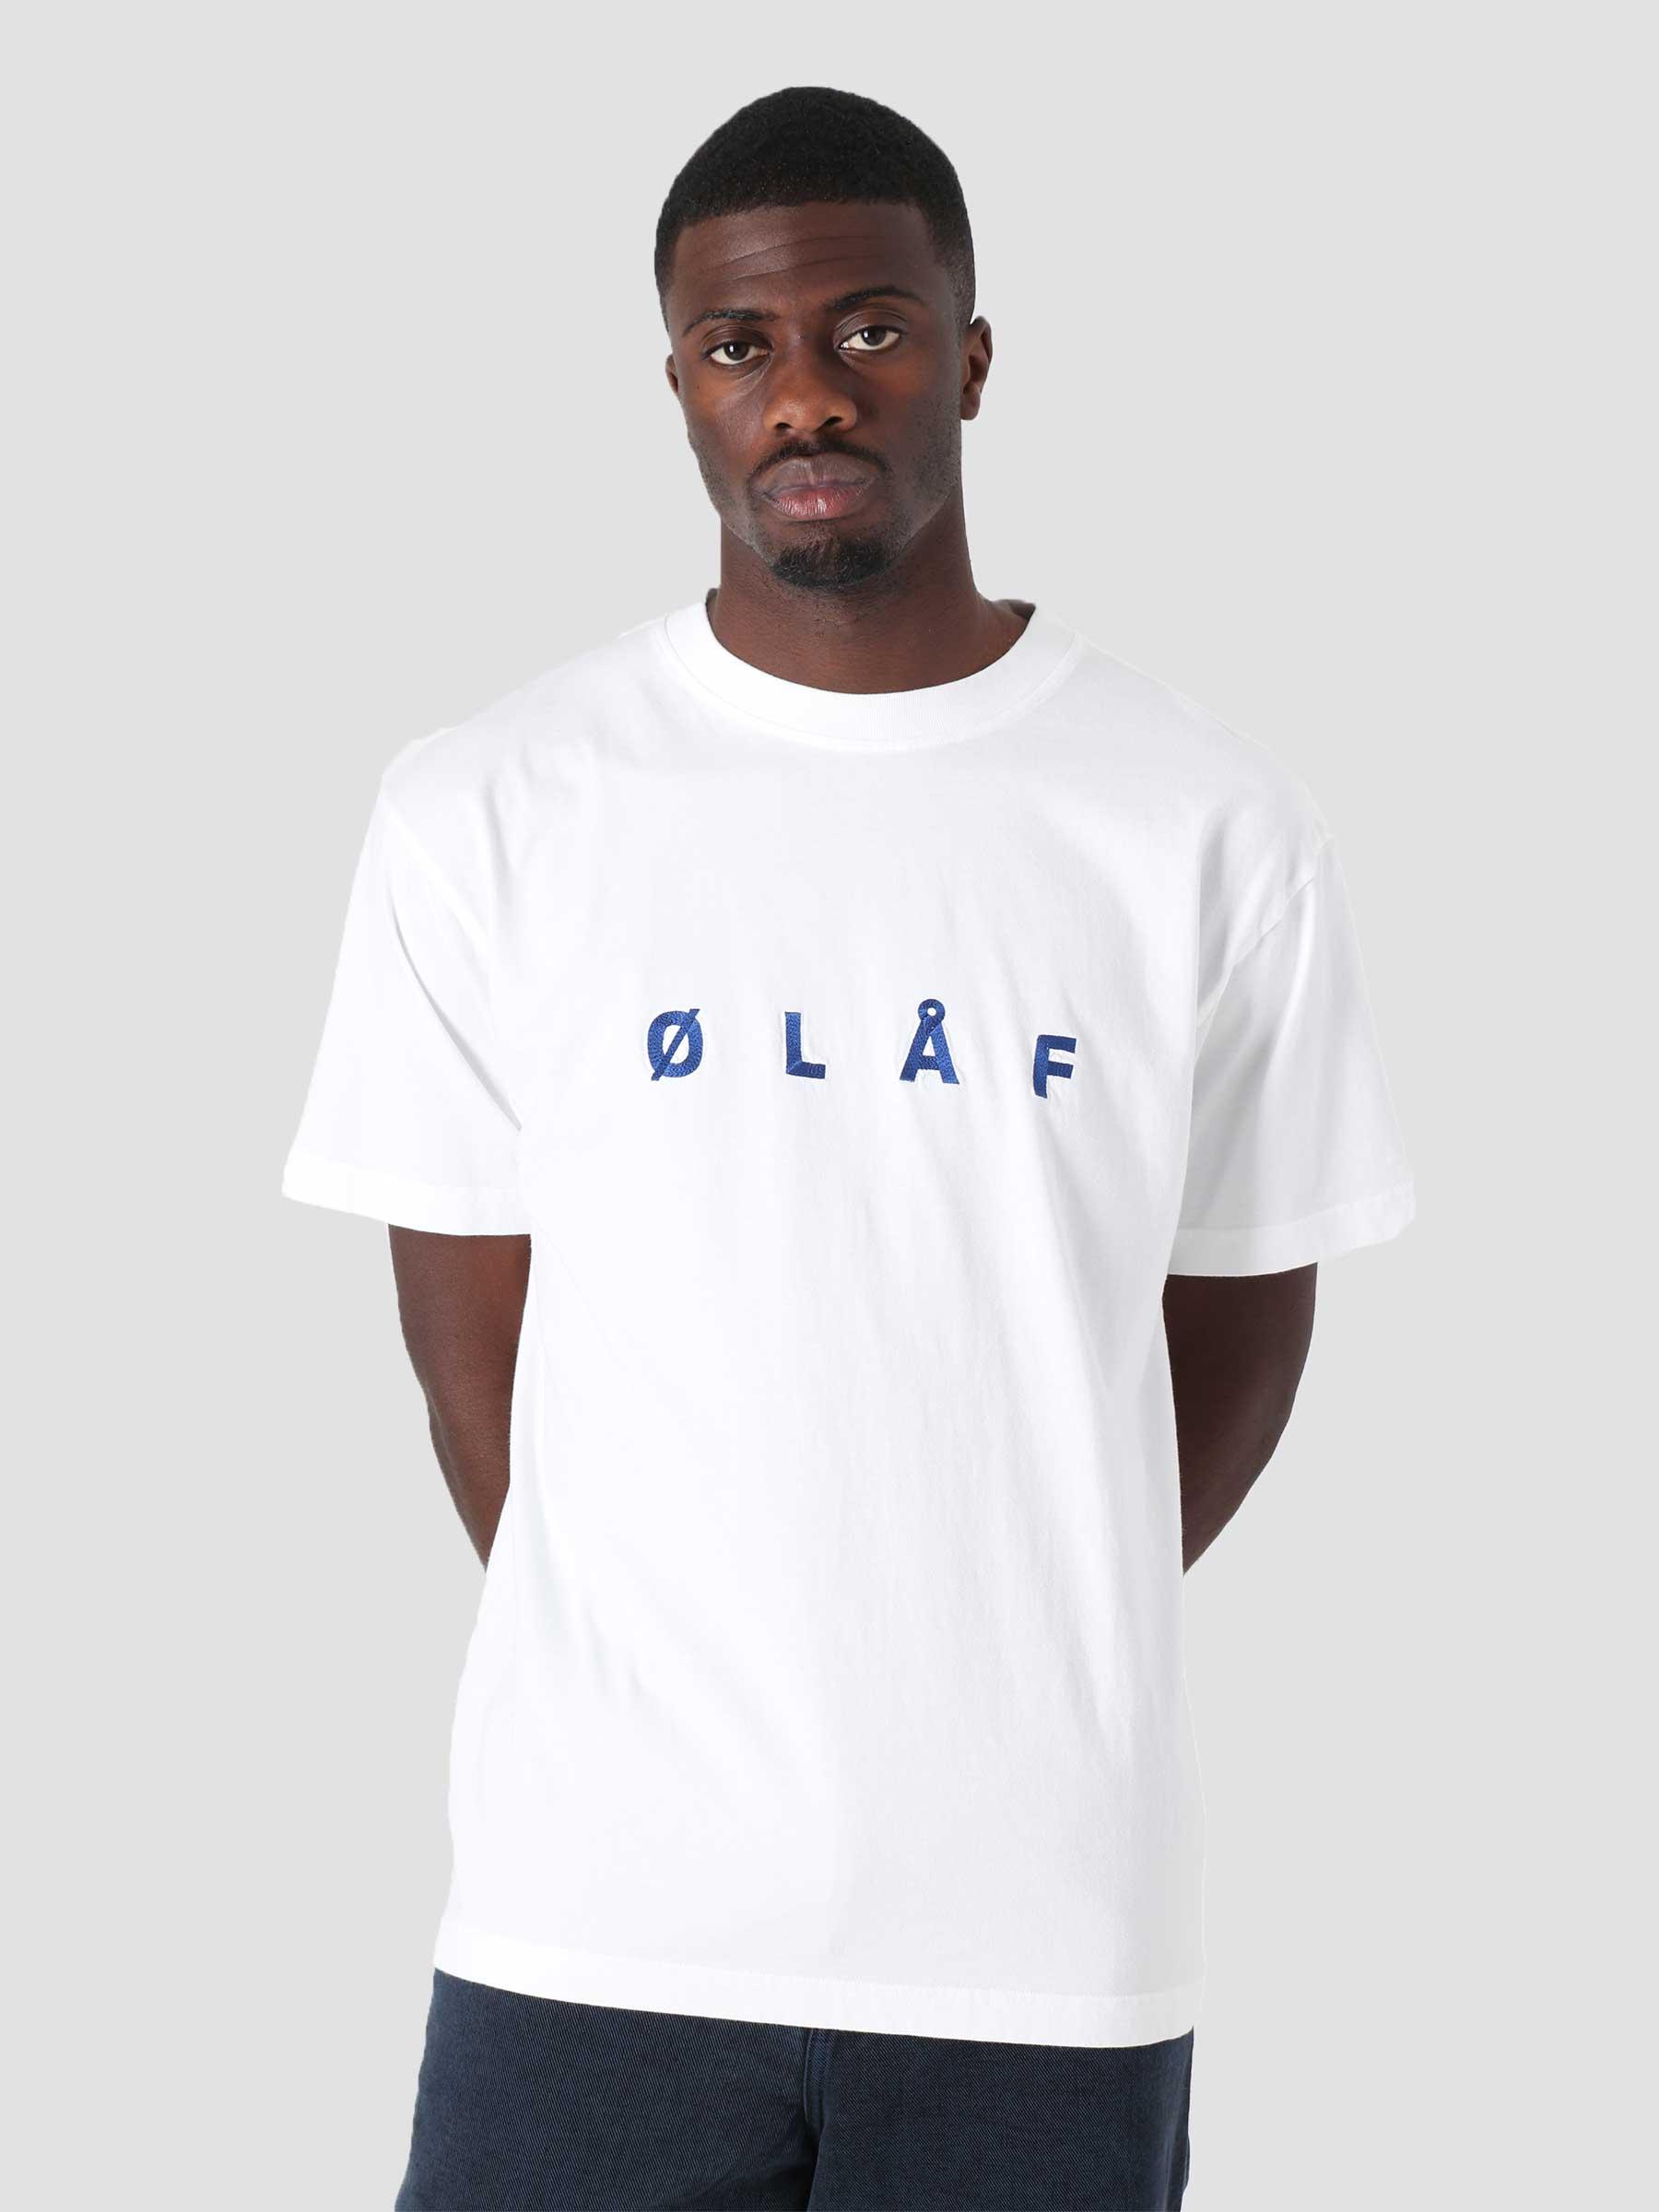 OLAF Chainstitch T-Shirt White